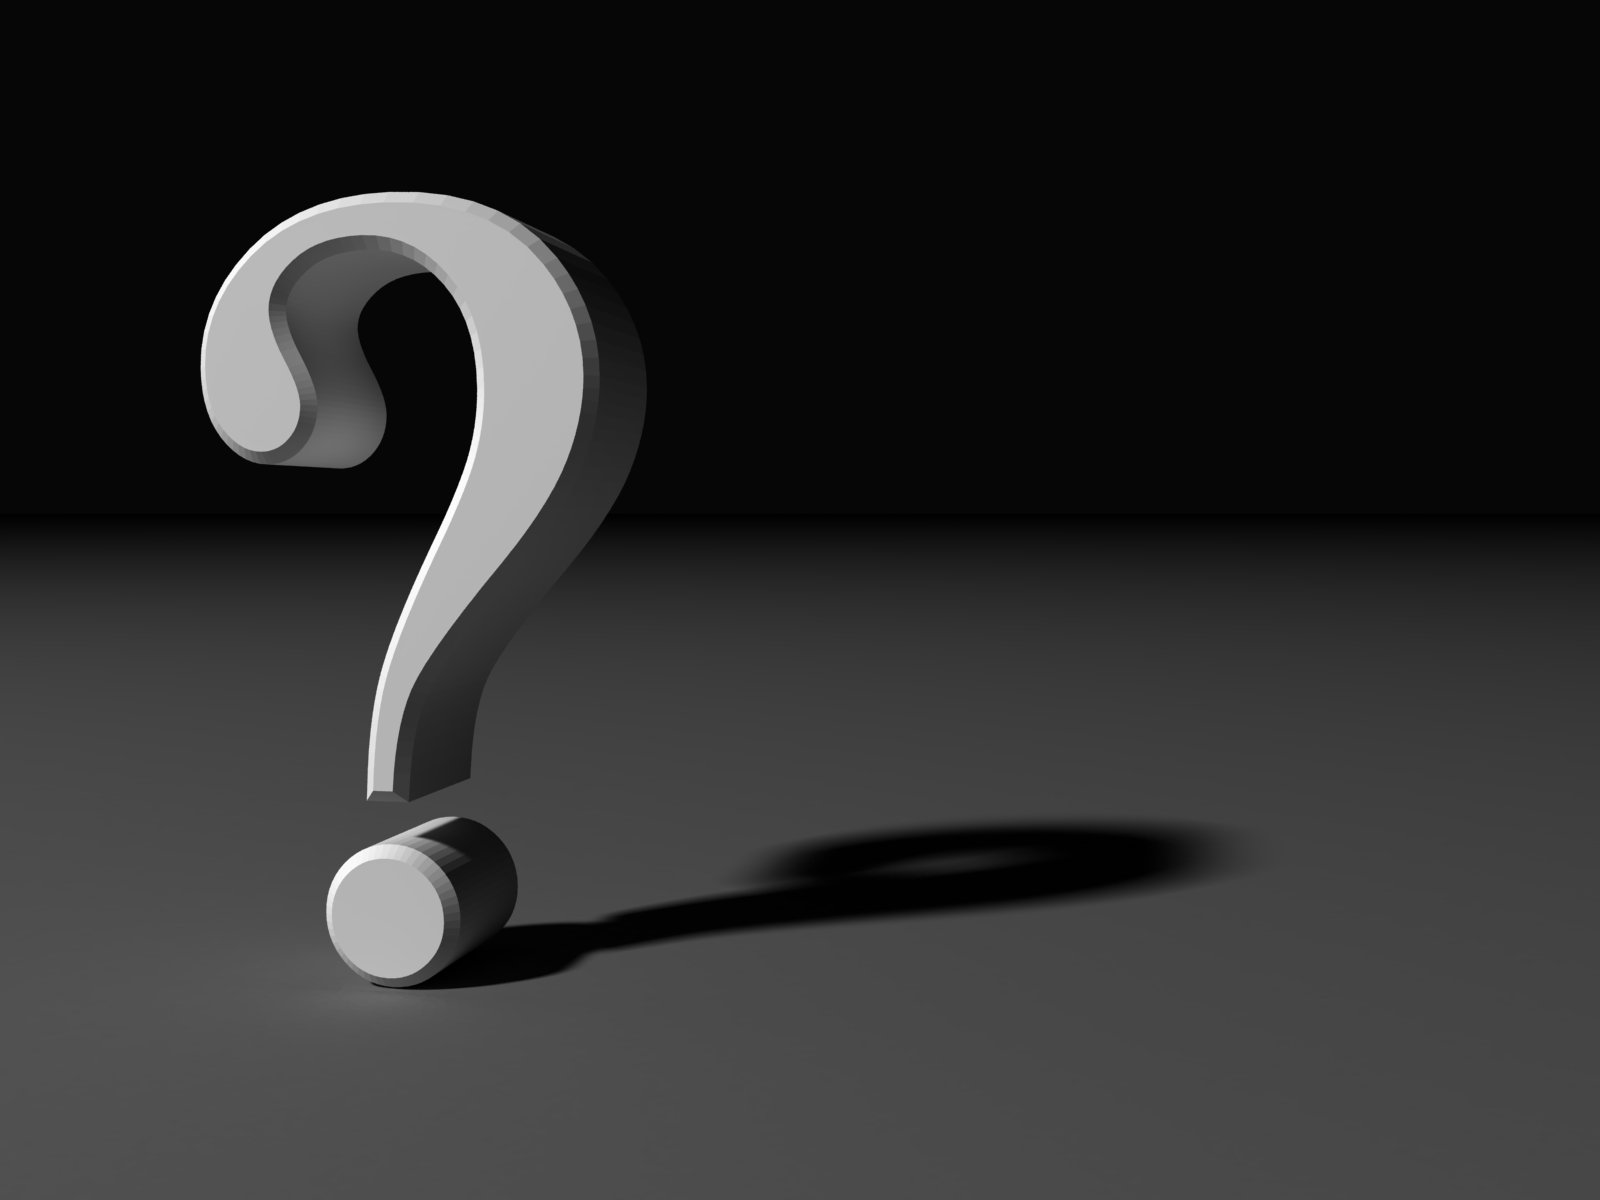 automobilverkäufer Frage